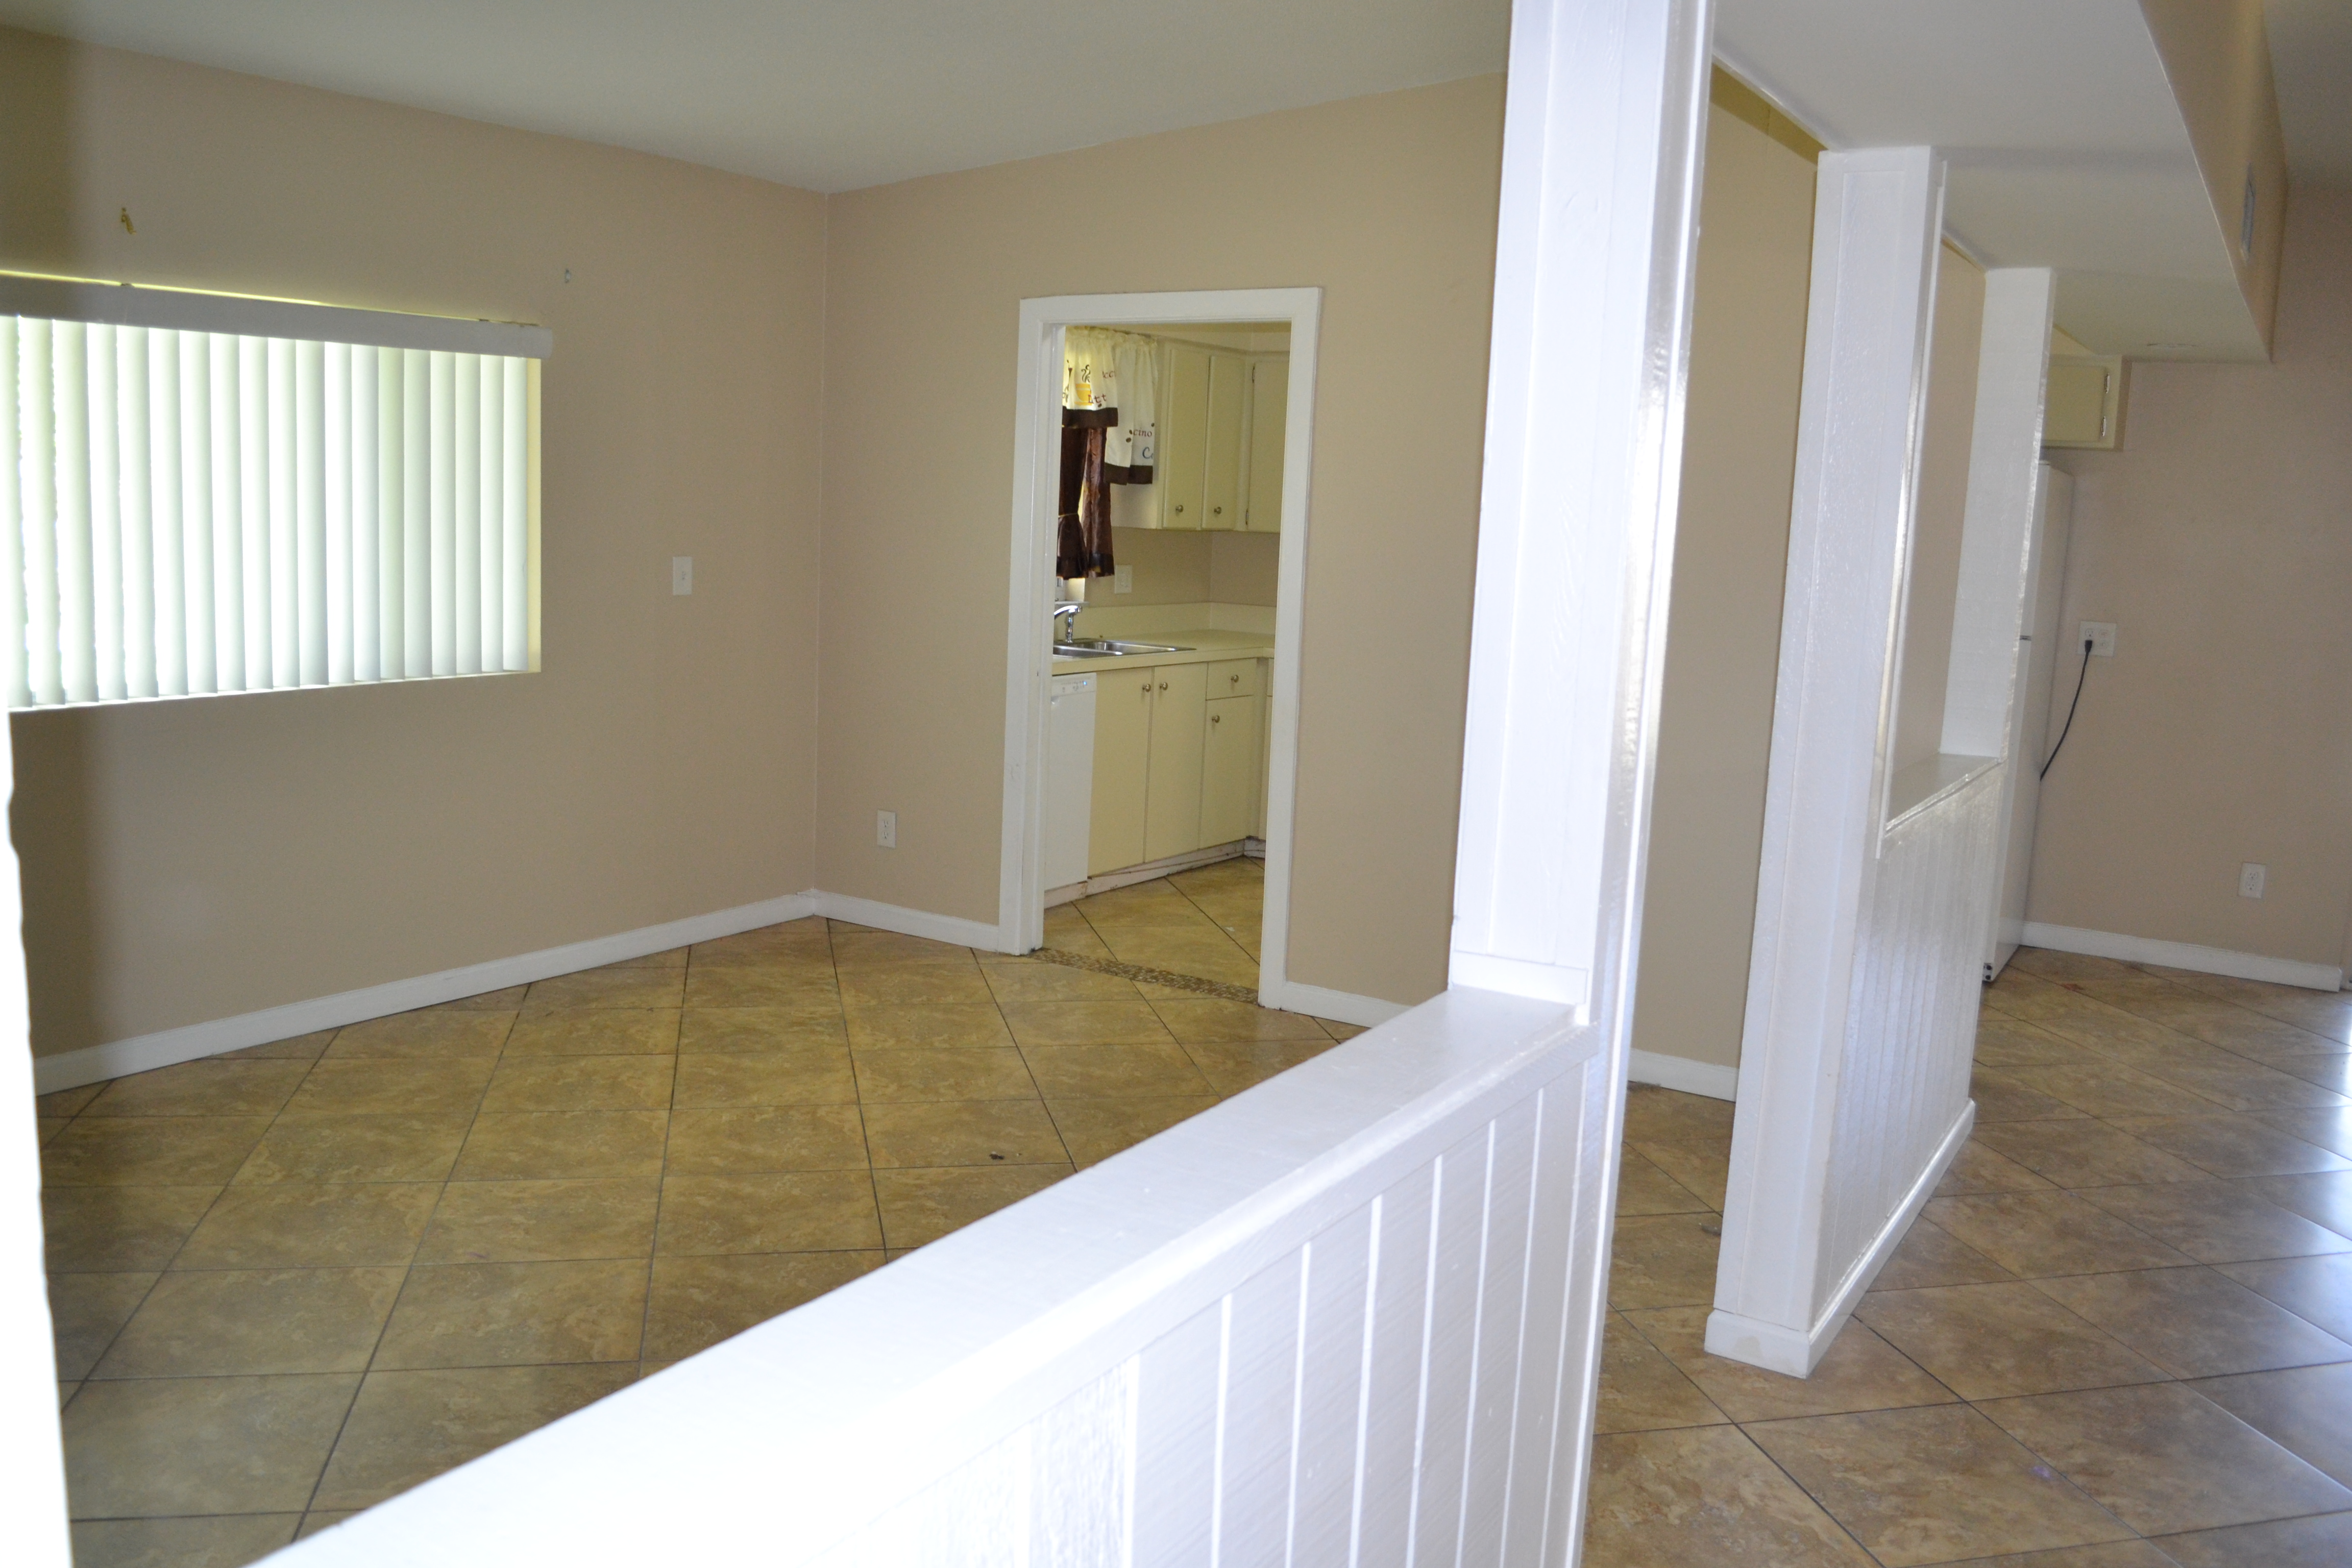 Photo of 419 E Maine Ave, Longwood, FL, 32750